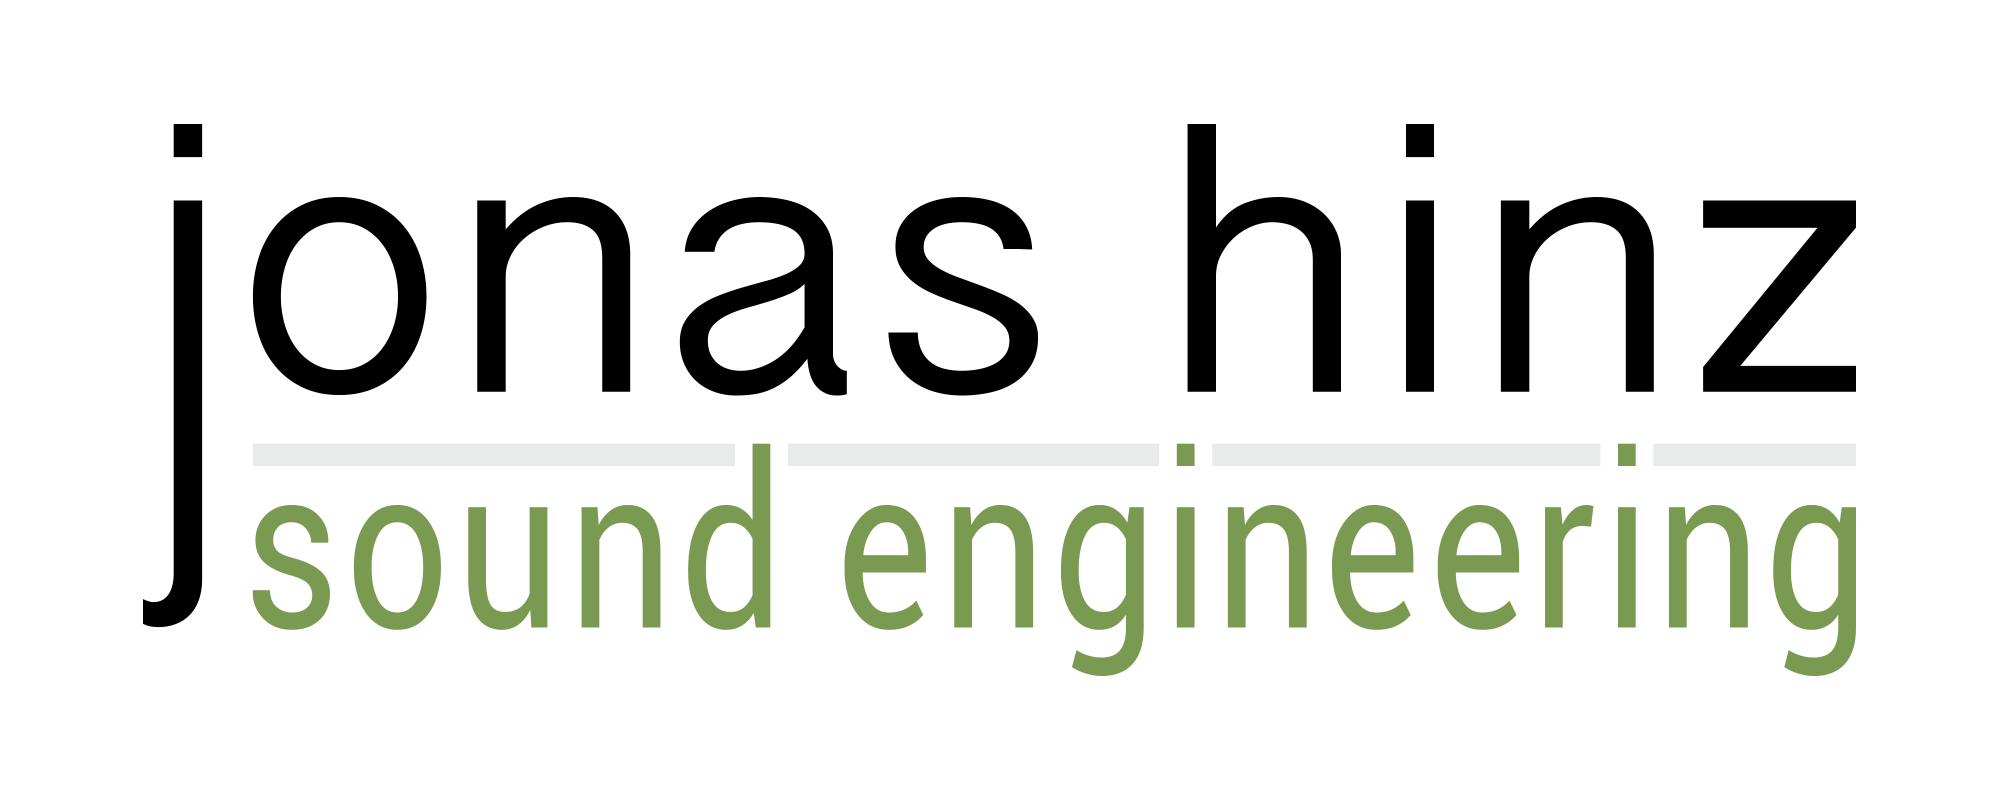 Jonas Hinz Redesign Neugestaltung Logo Logogestaltung Logodesign